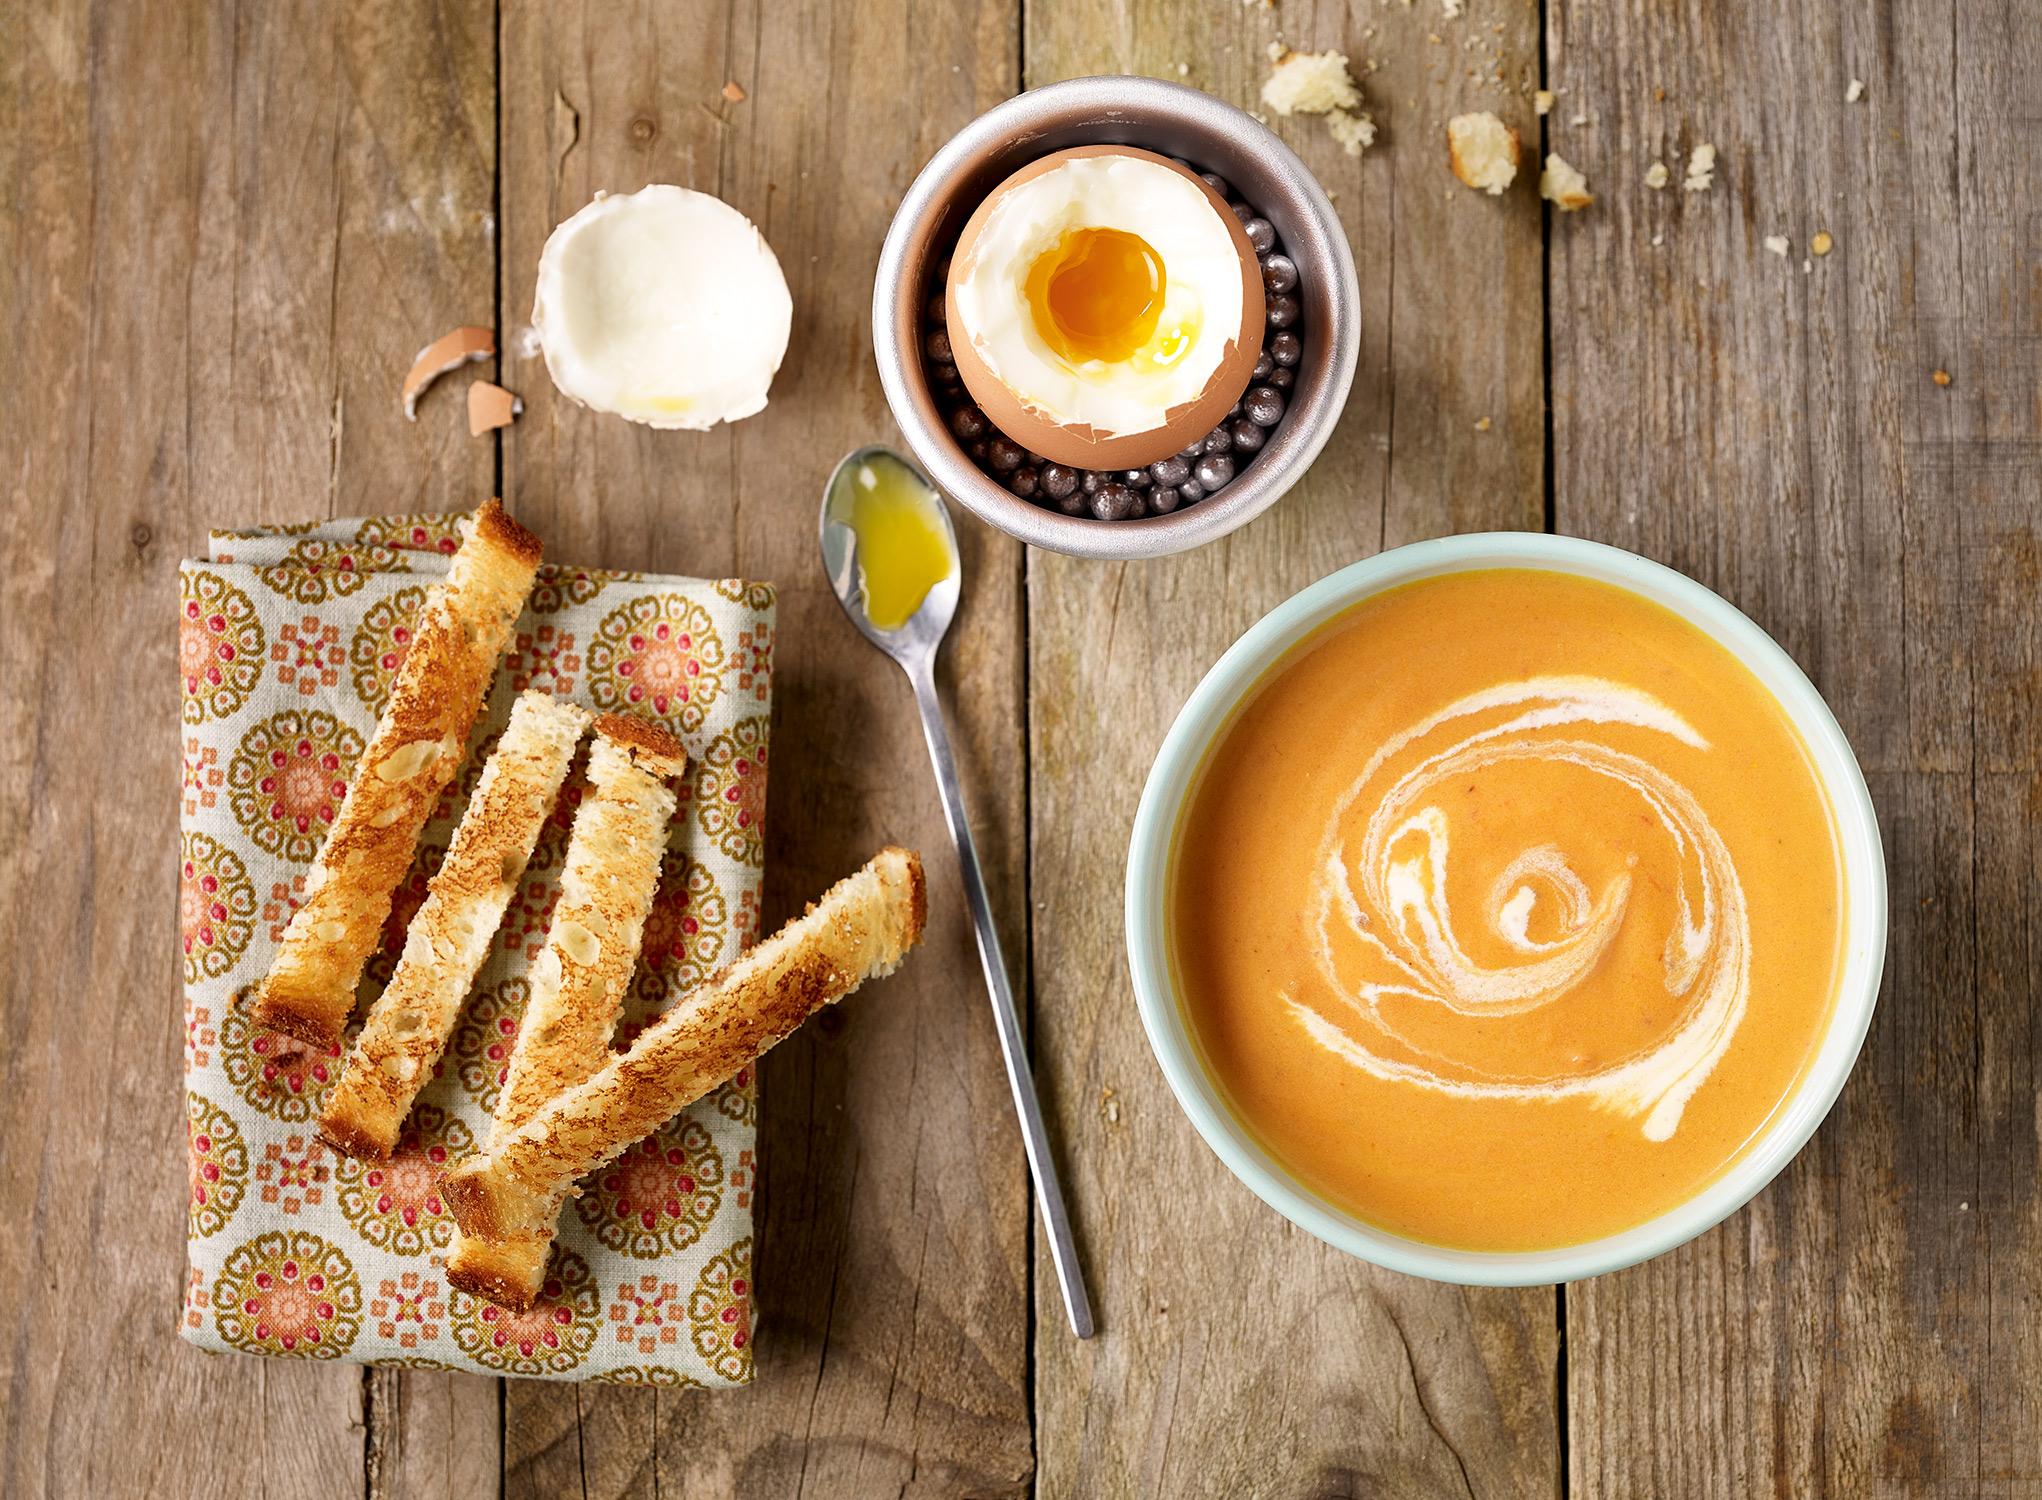 celia-goumard-photographe-culinaire-soup